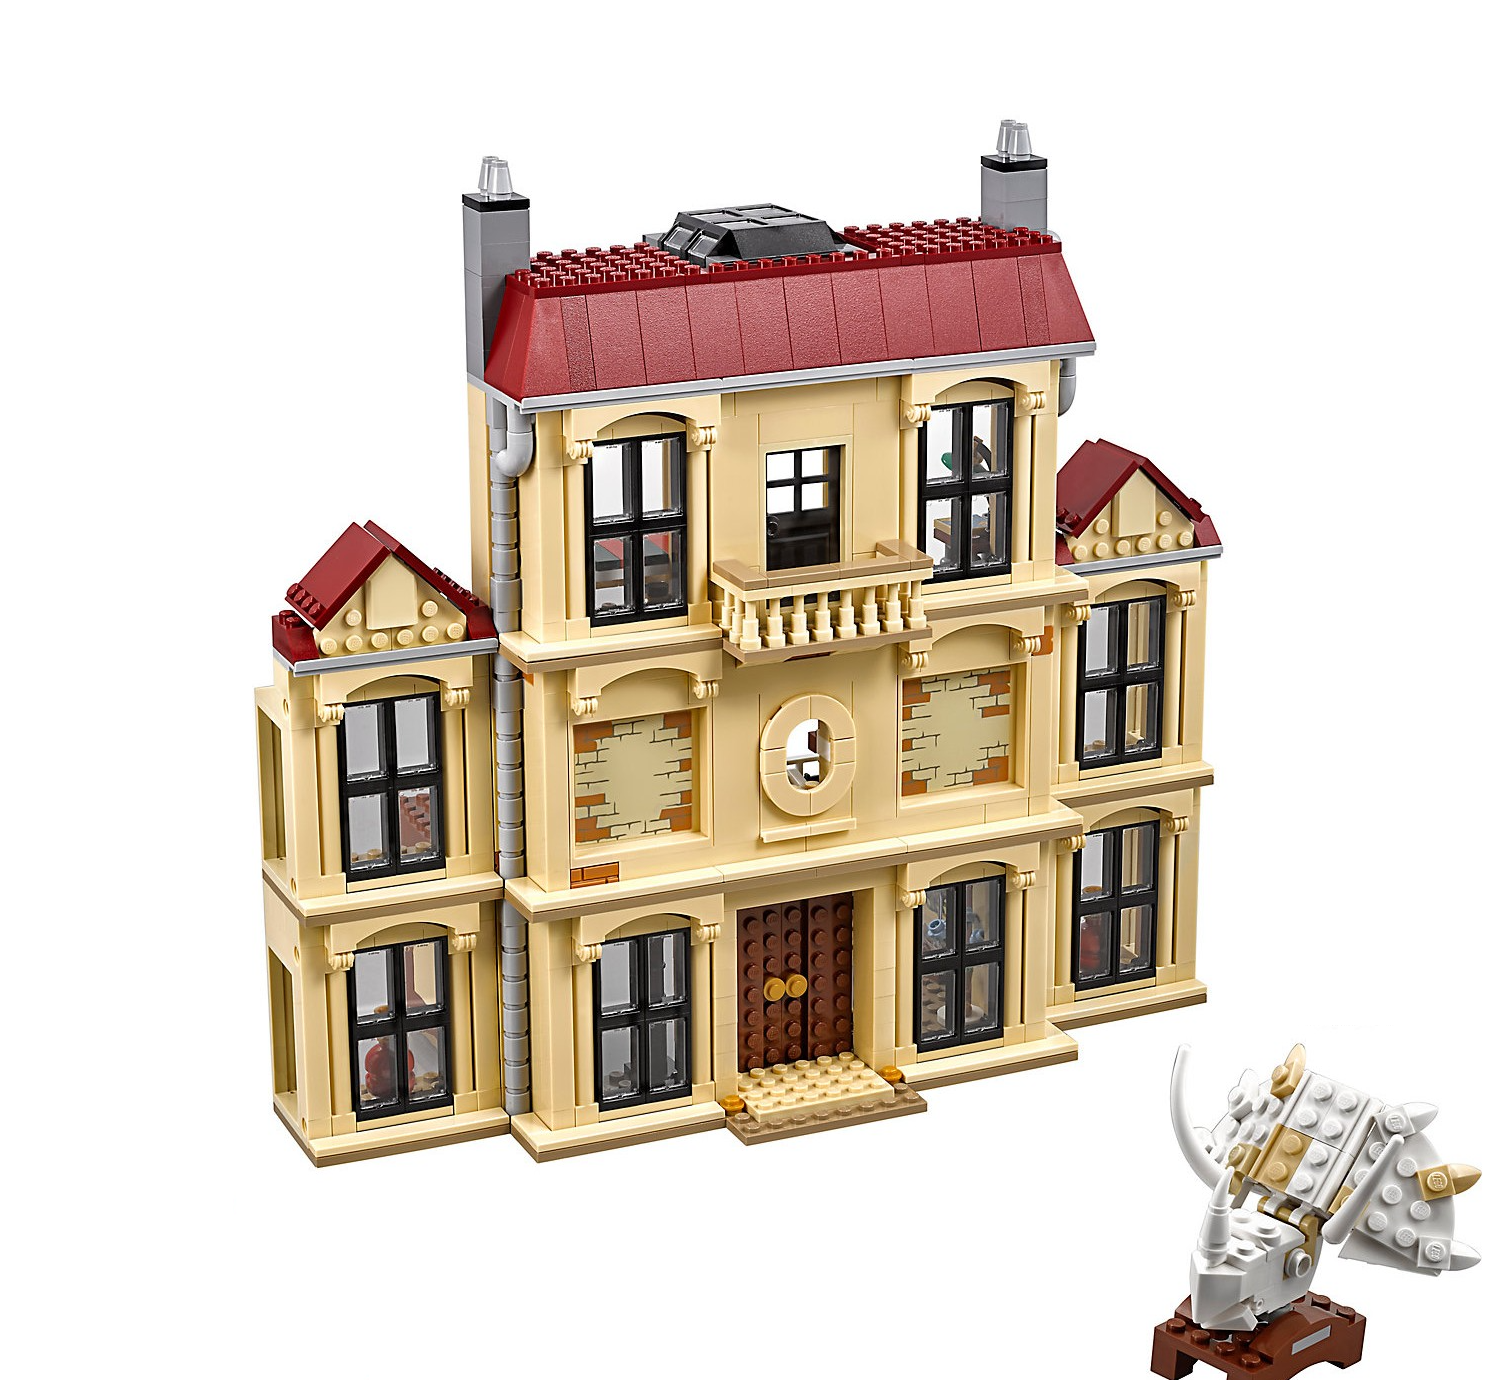 LEGO Jurassic Welt 75930 Indoraptor LockHolz Estate No Minifigures Box Dinosaur